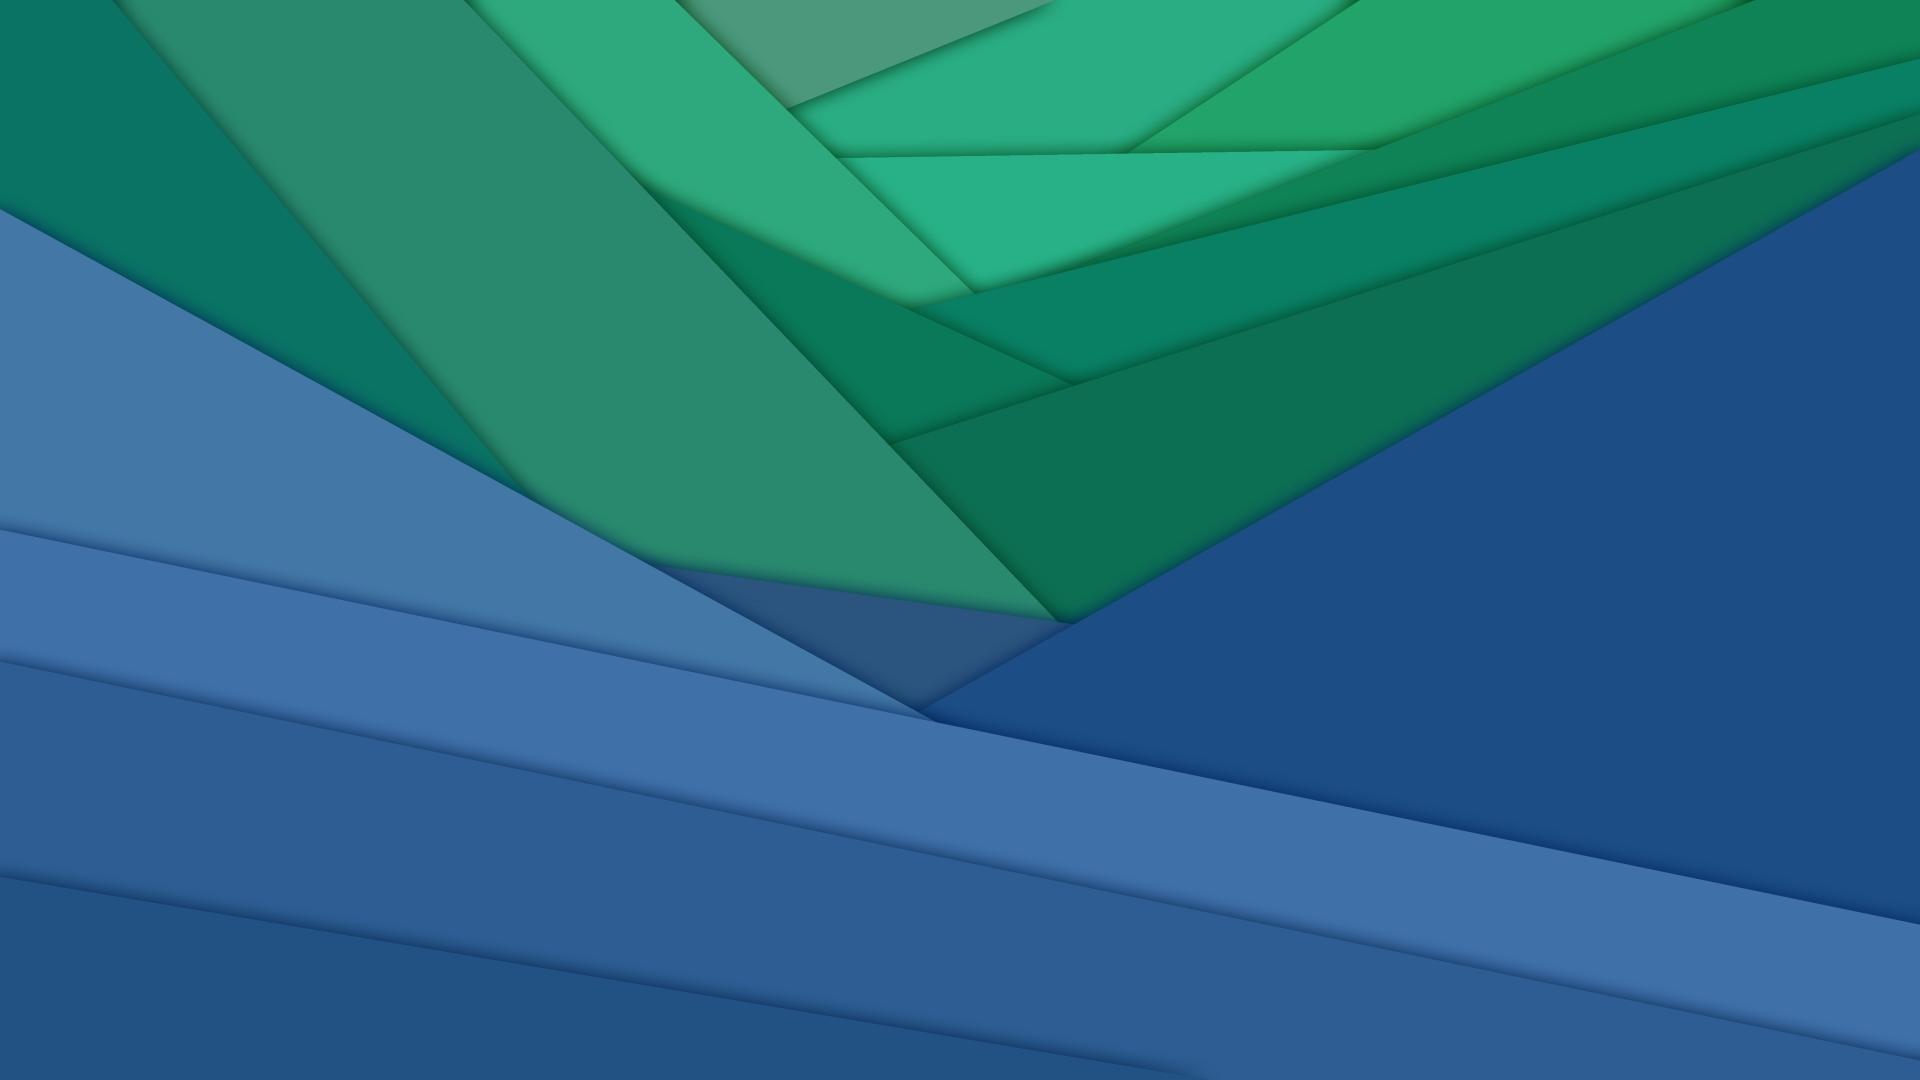 Modern Hero Material Wallpaper by JamesHD2K on DeviantArt